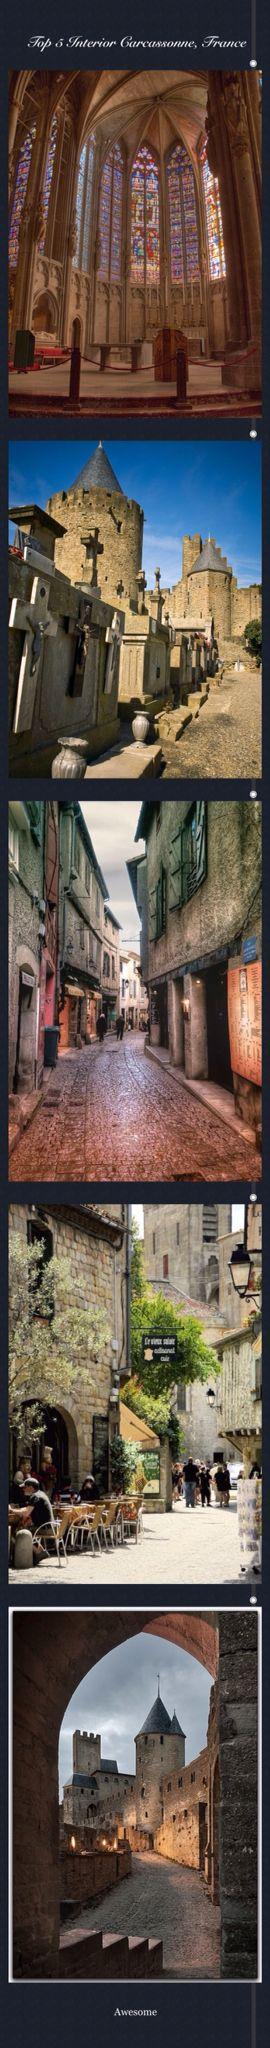 Top 5 Interior Carcassonne, France